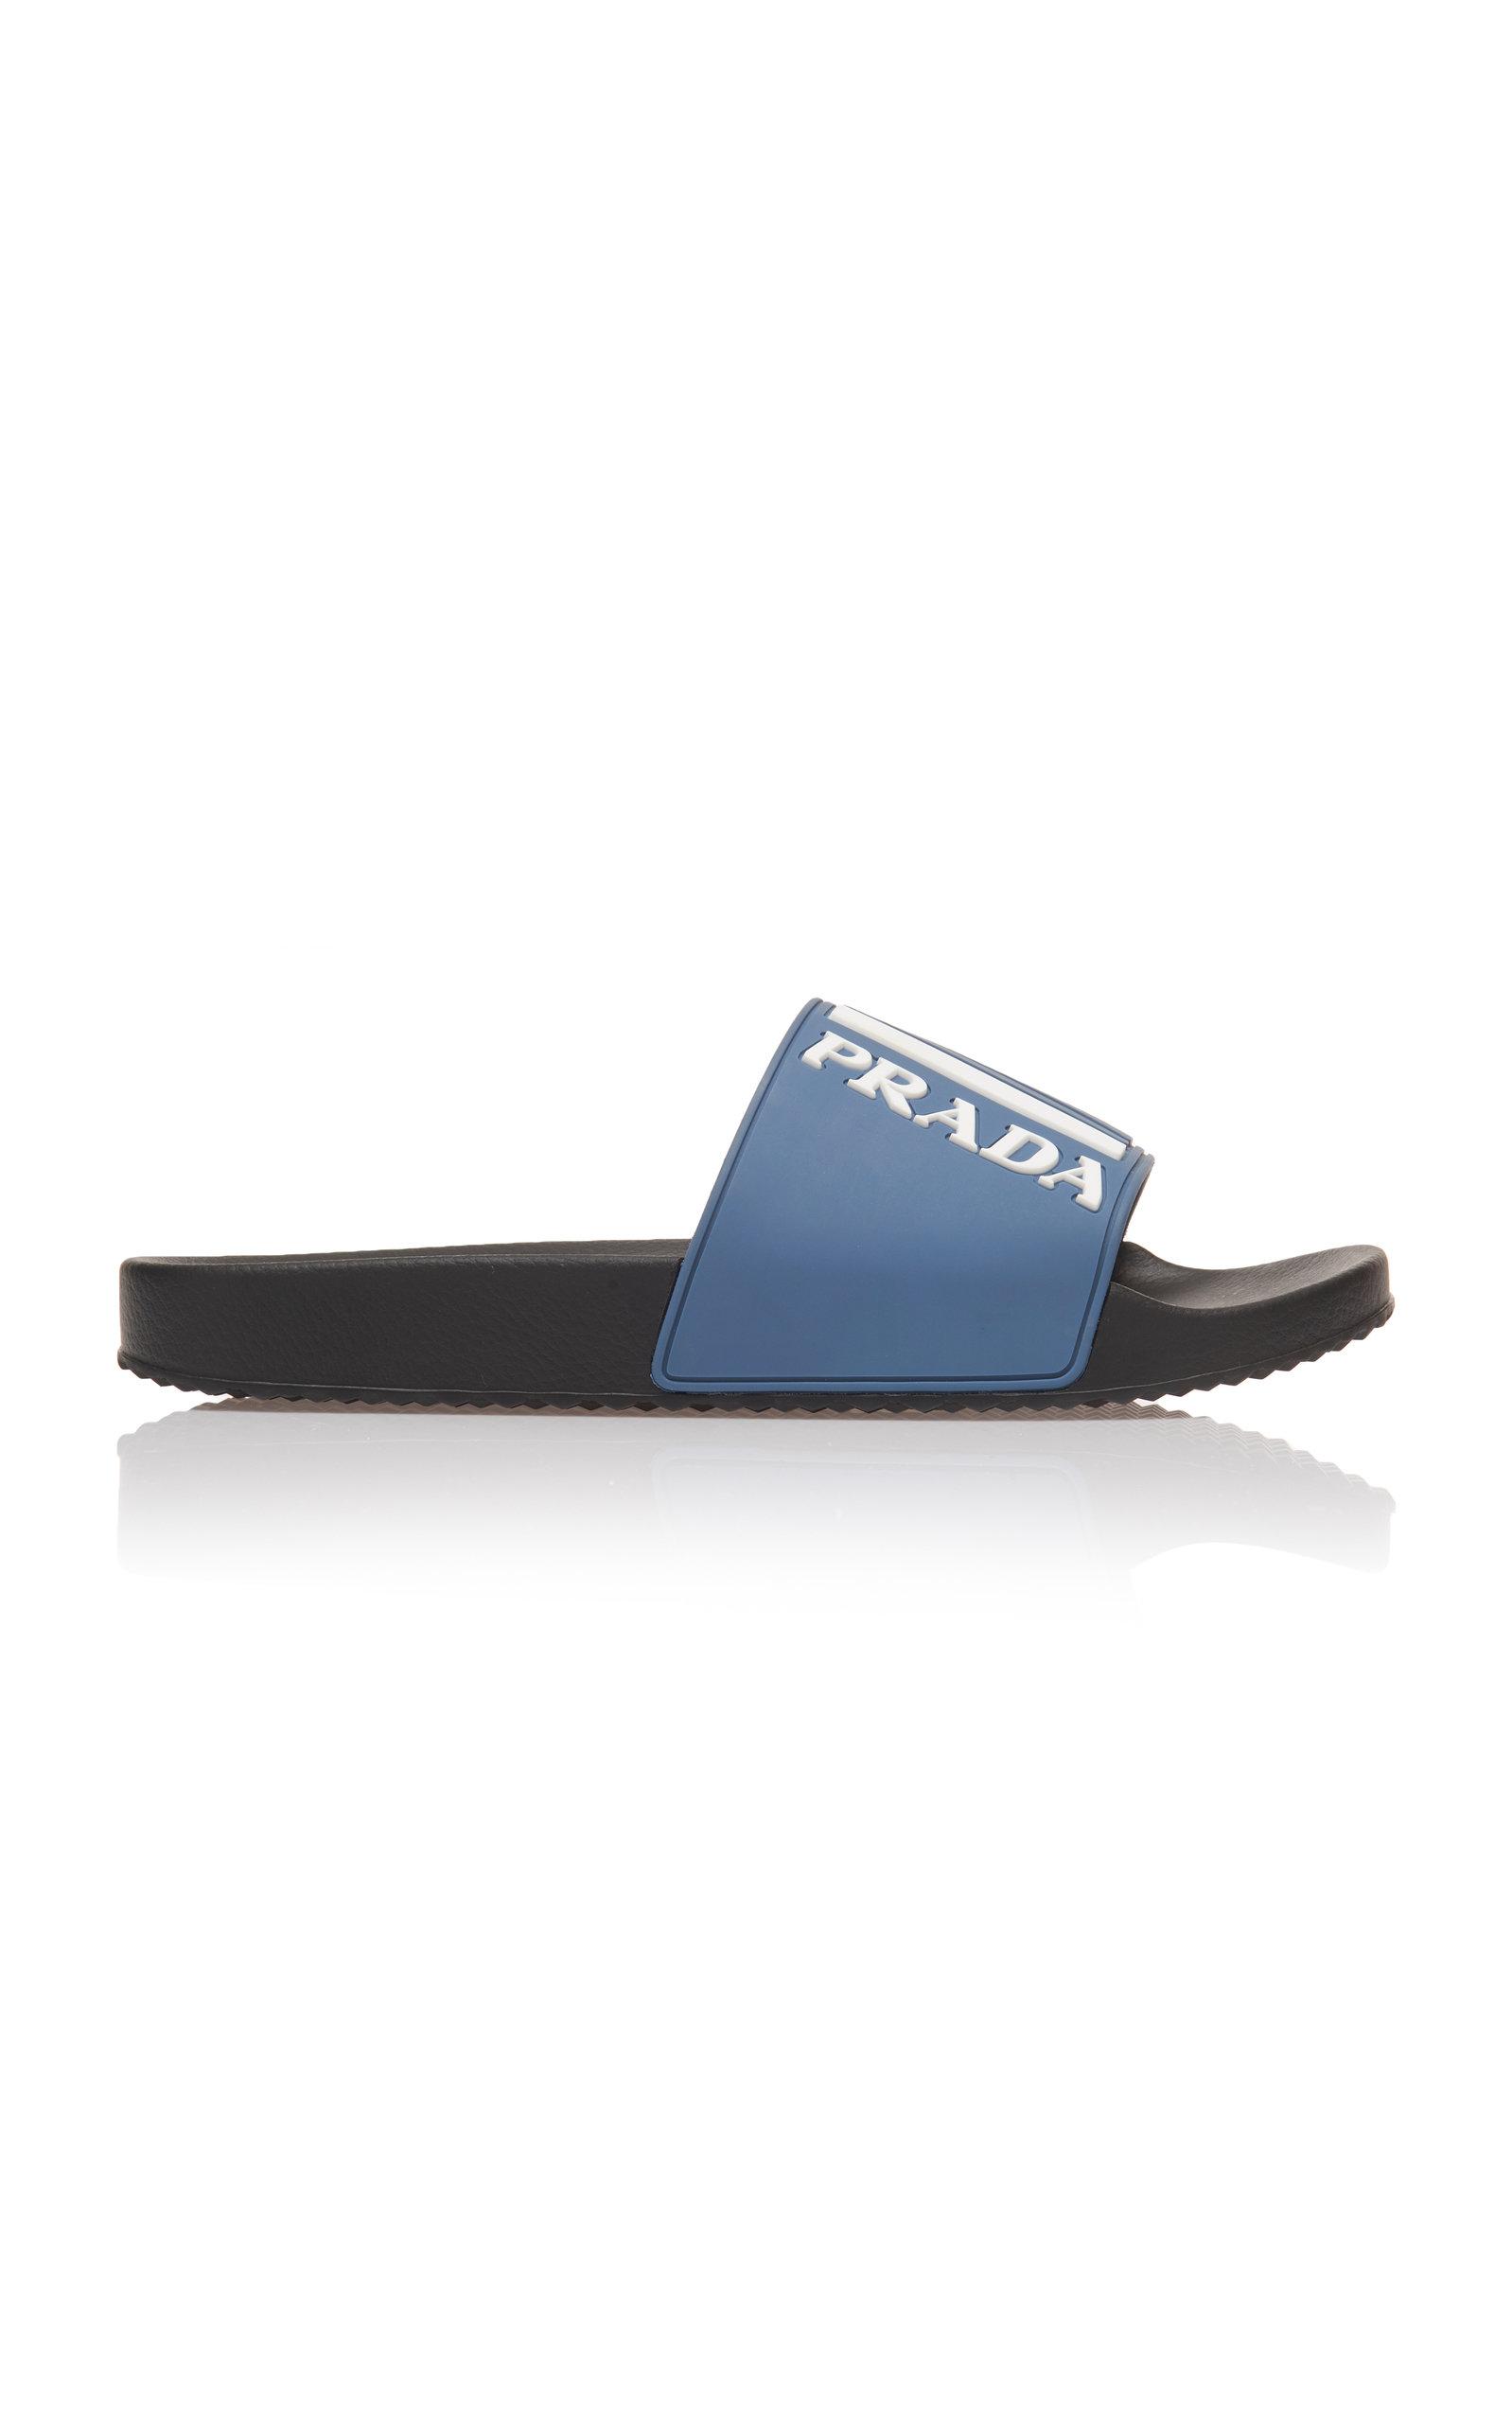 6adb98ace357 PradaLogo Rubber Slides. CLOSE. Loading